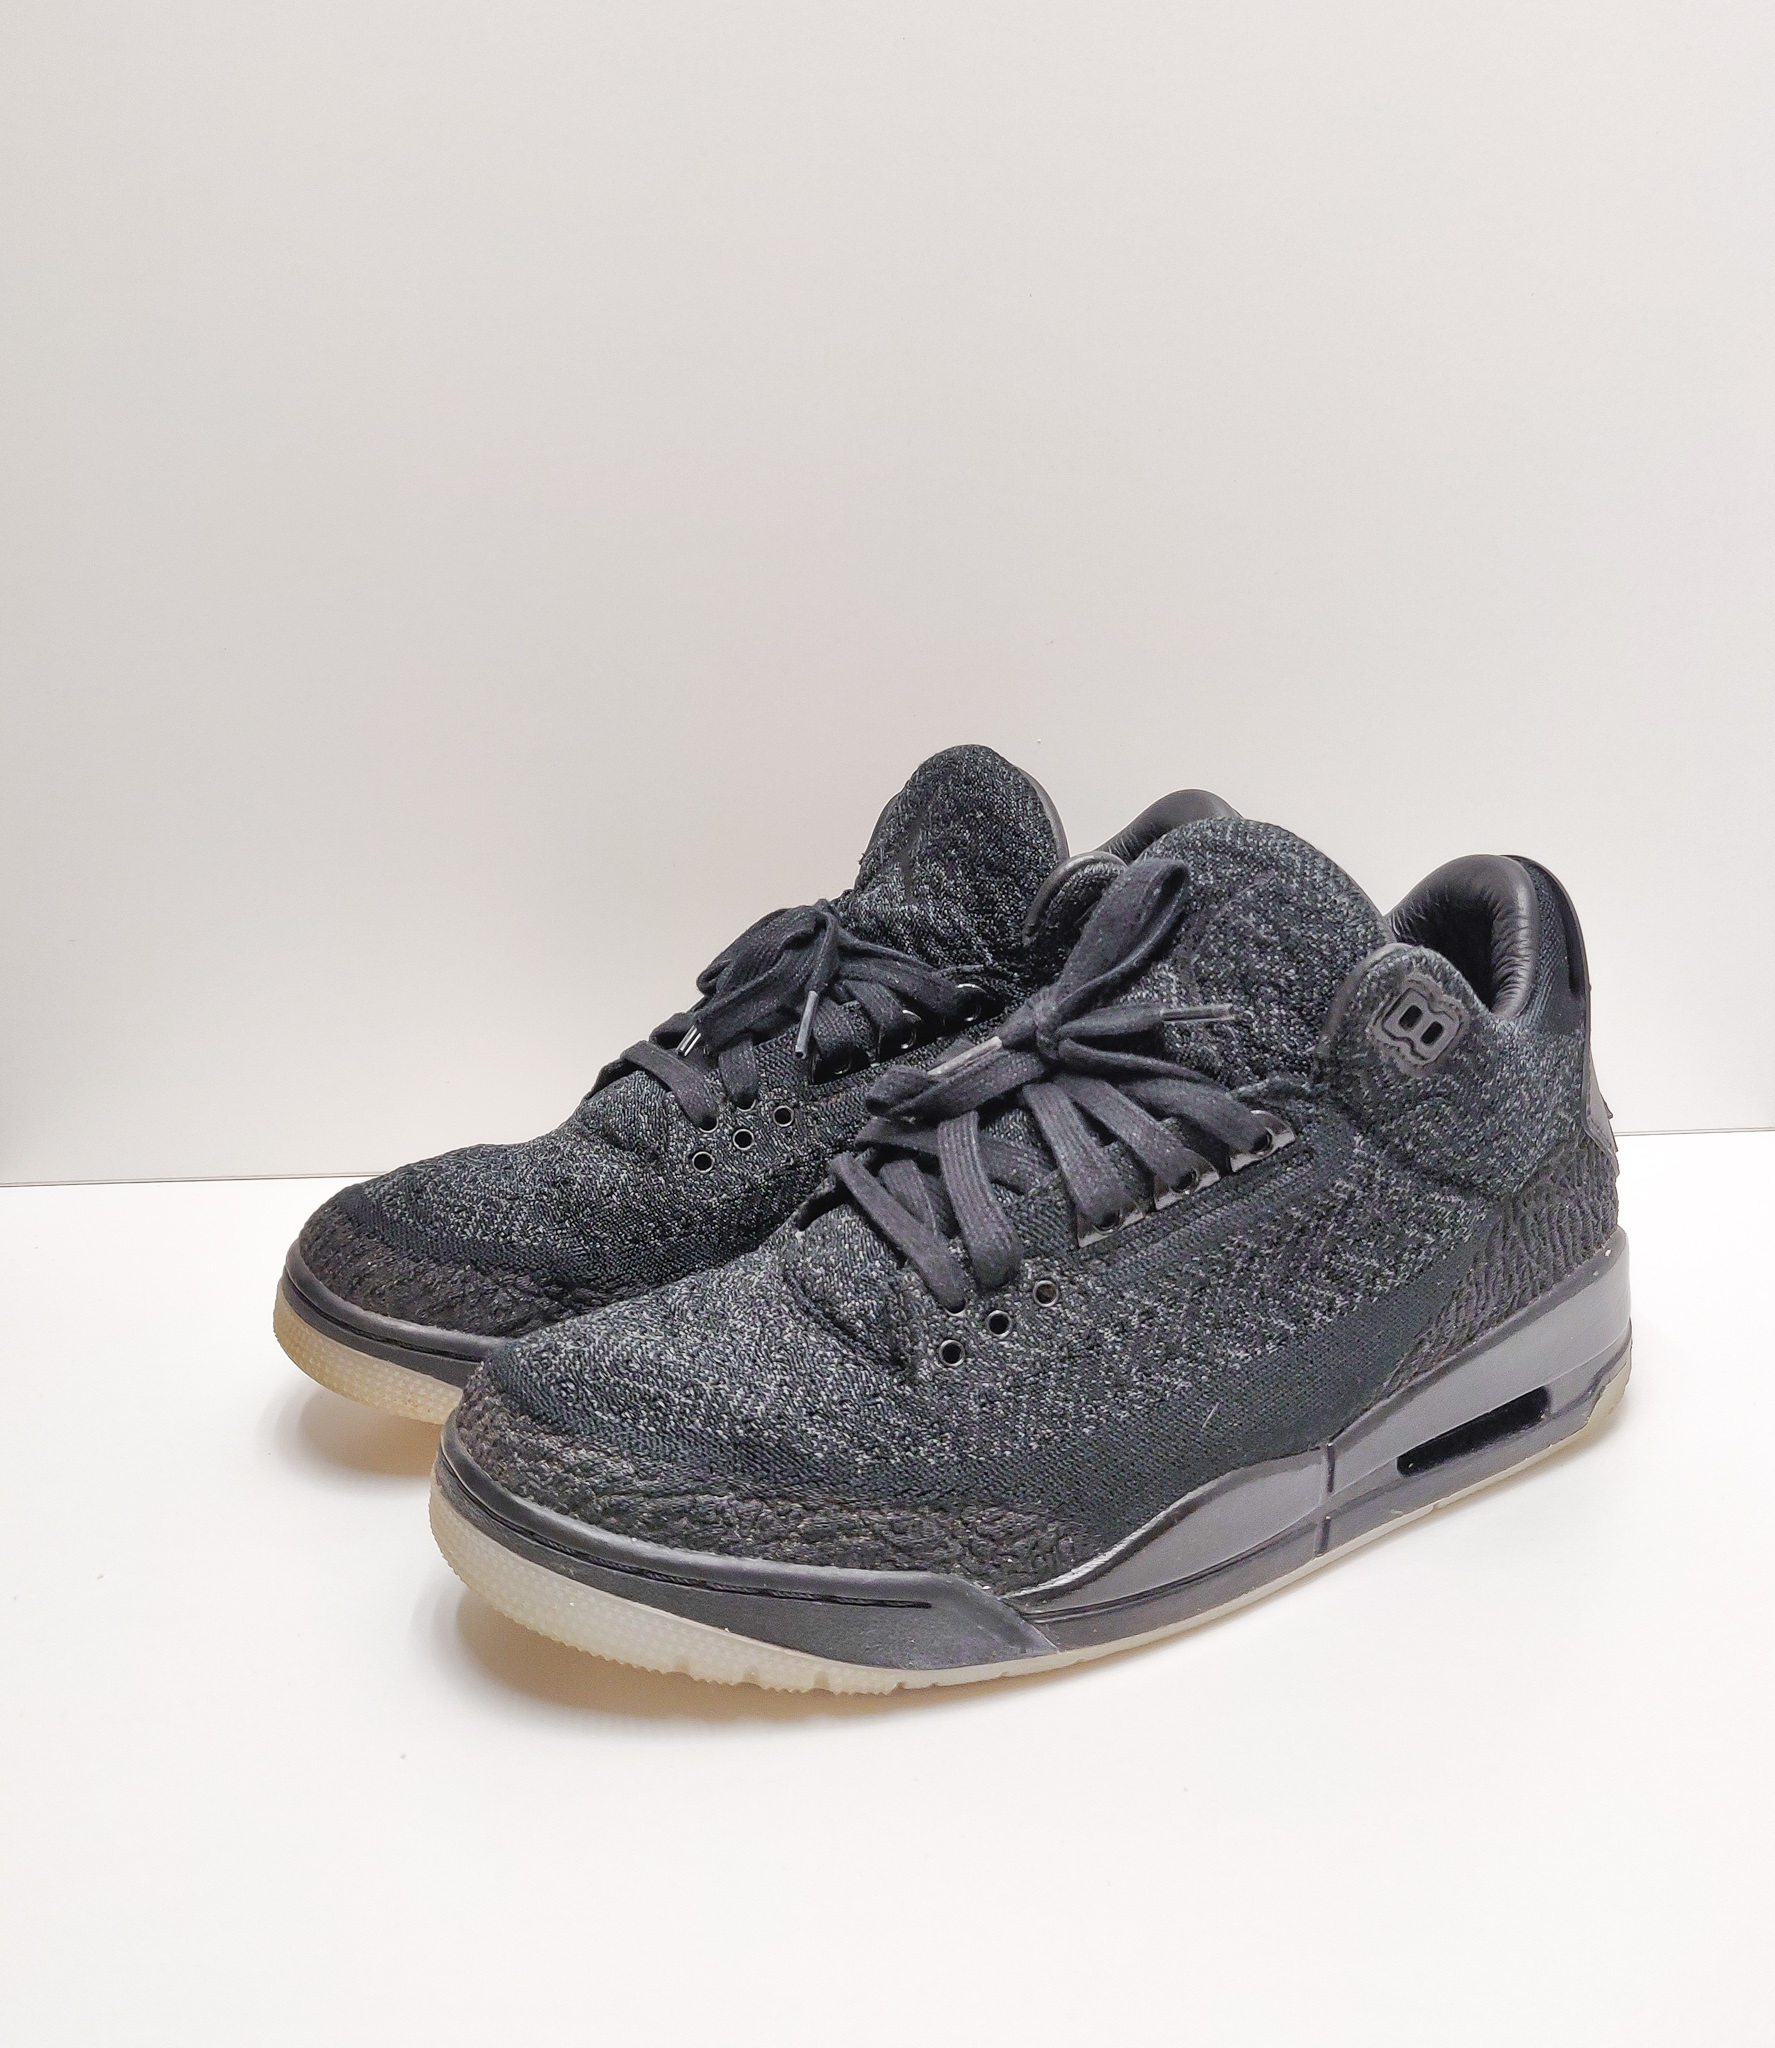 Jordan 3 Retro Flyknit Black